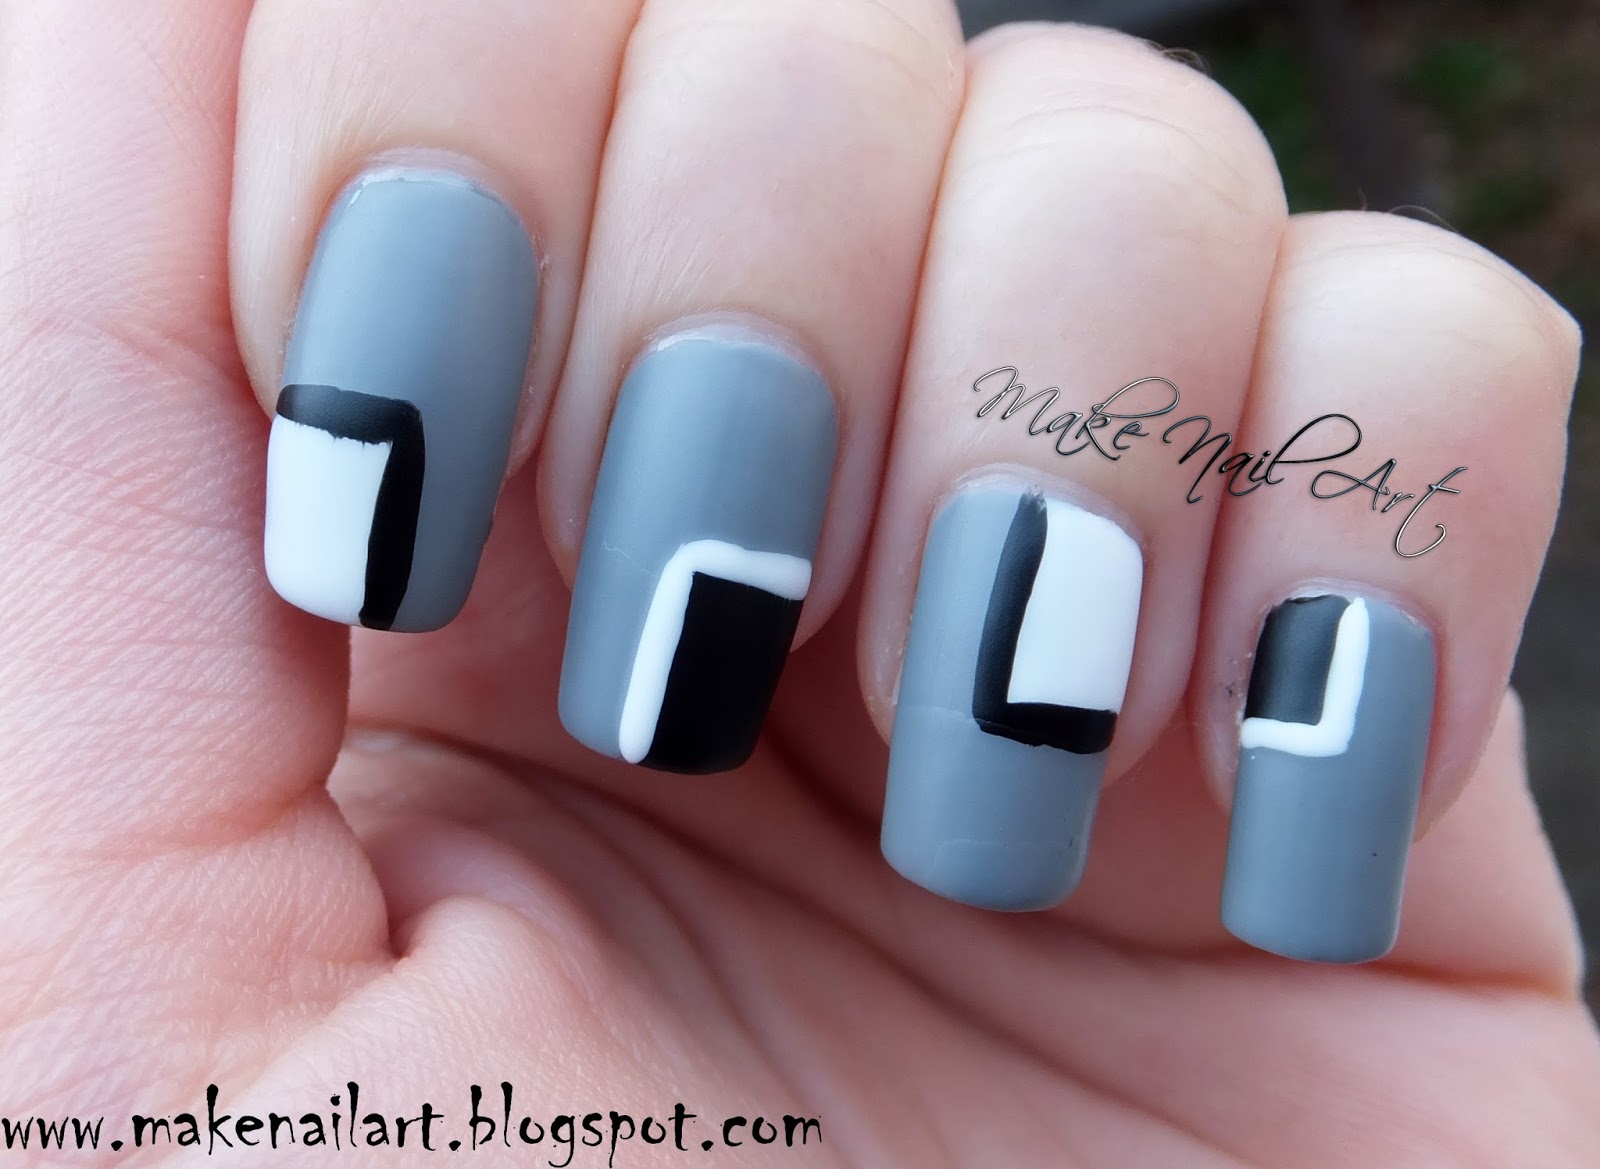 Make Nail Art: January 2016